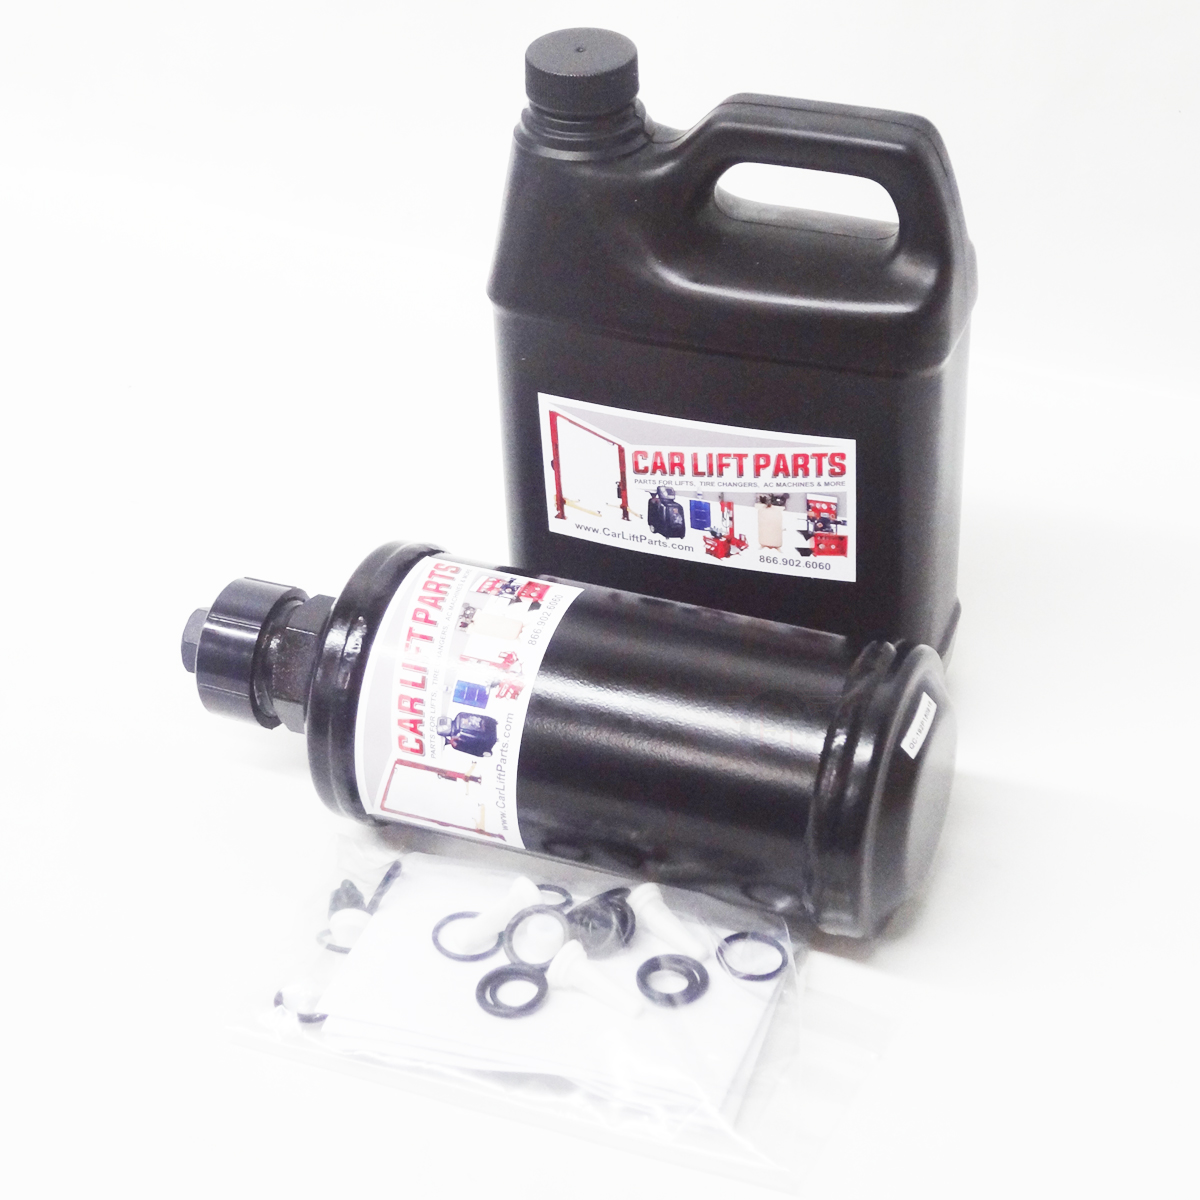 Bosch ACS620 / ACS615 A/C Recovery Machine Filter ...